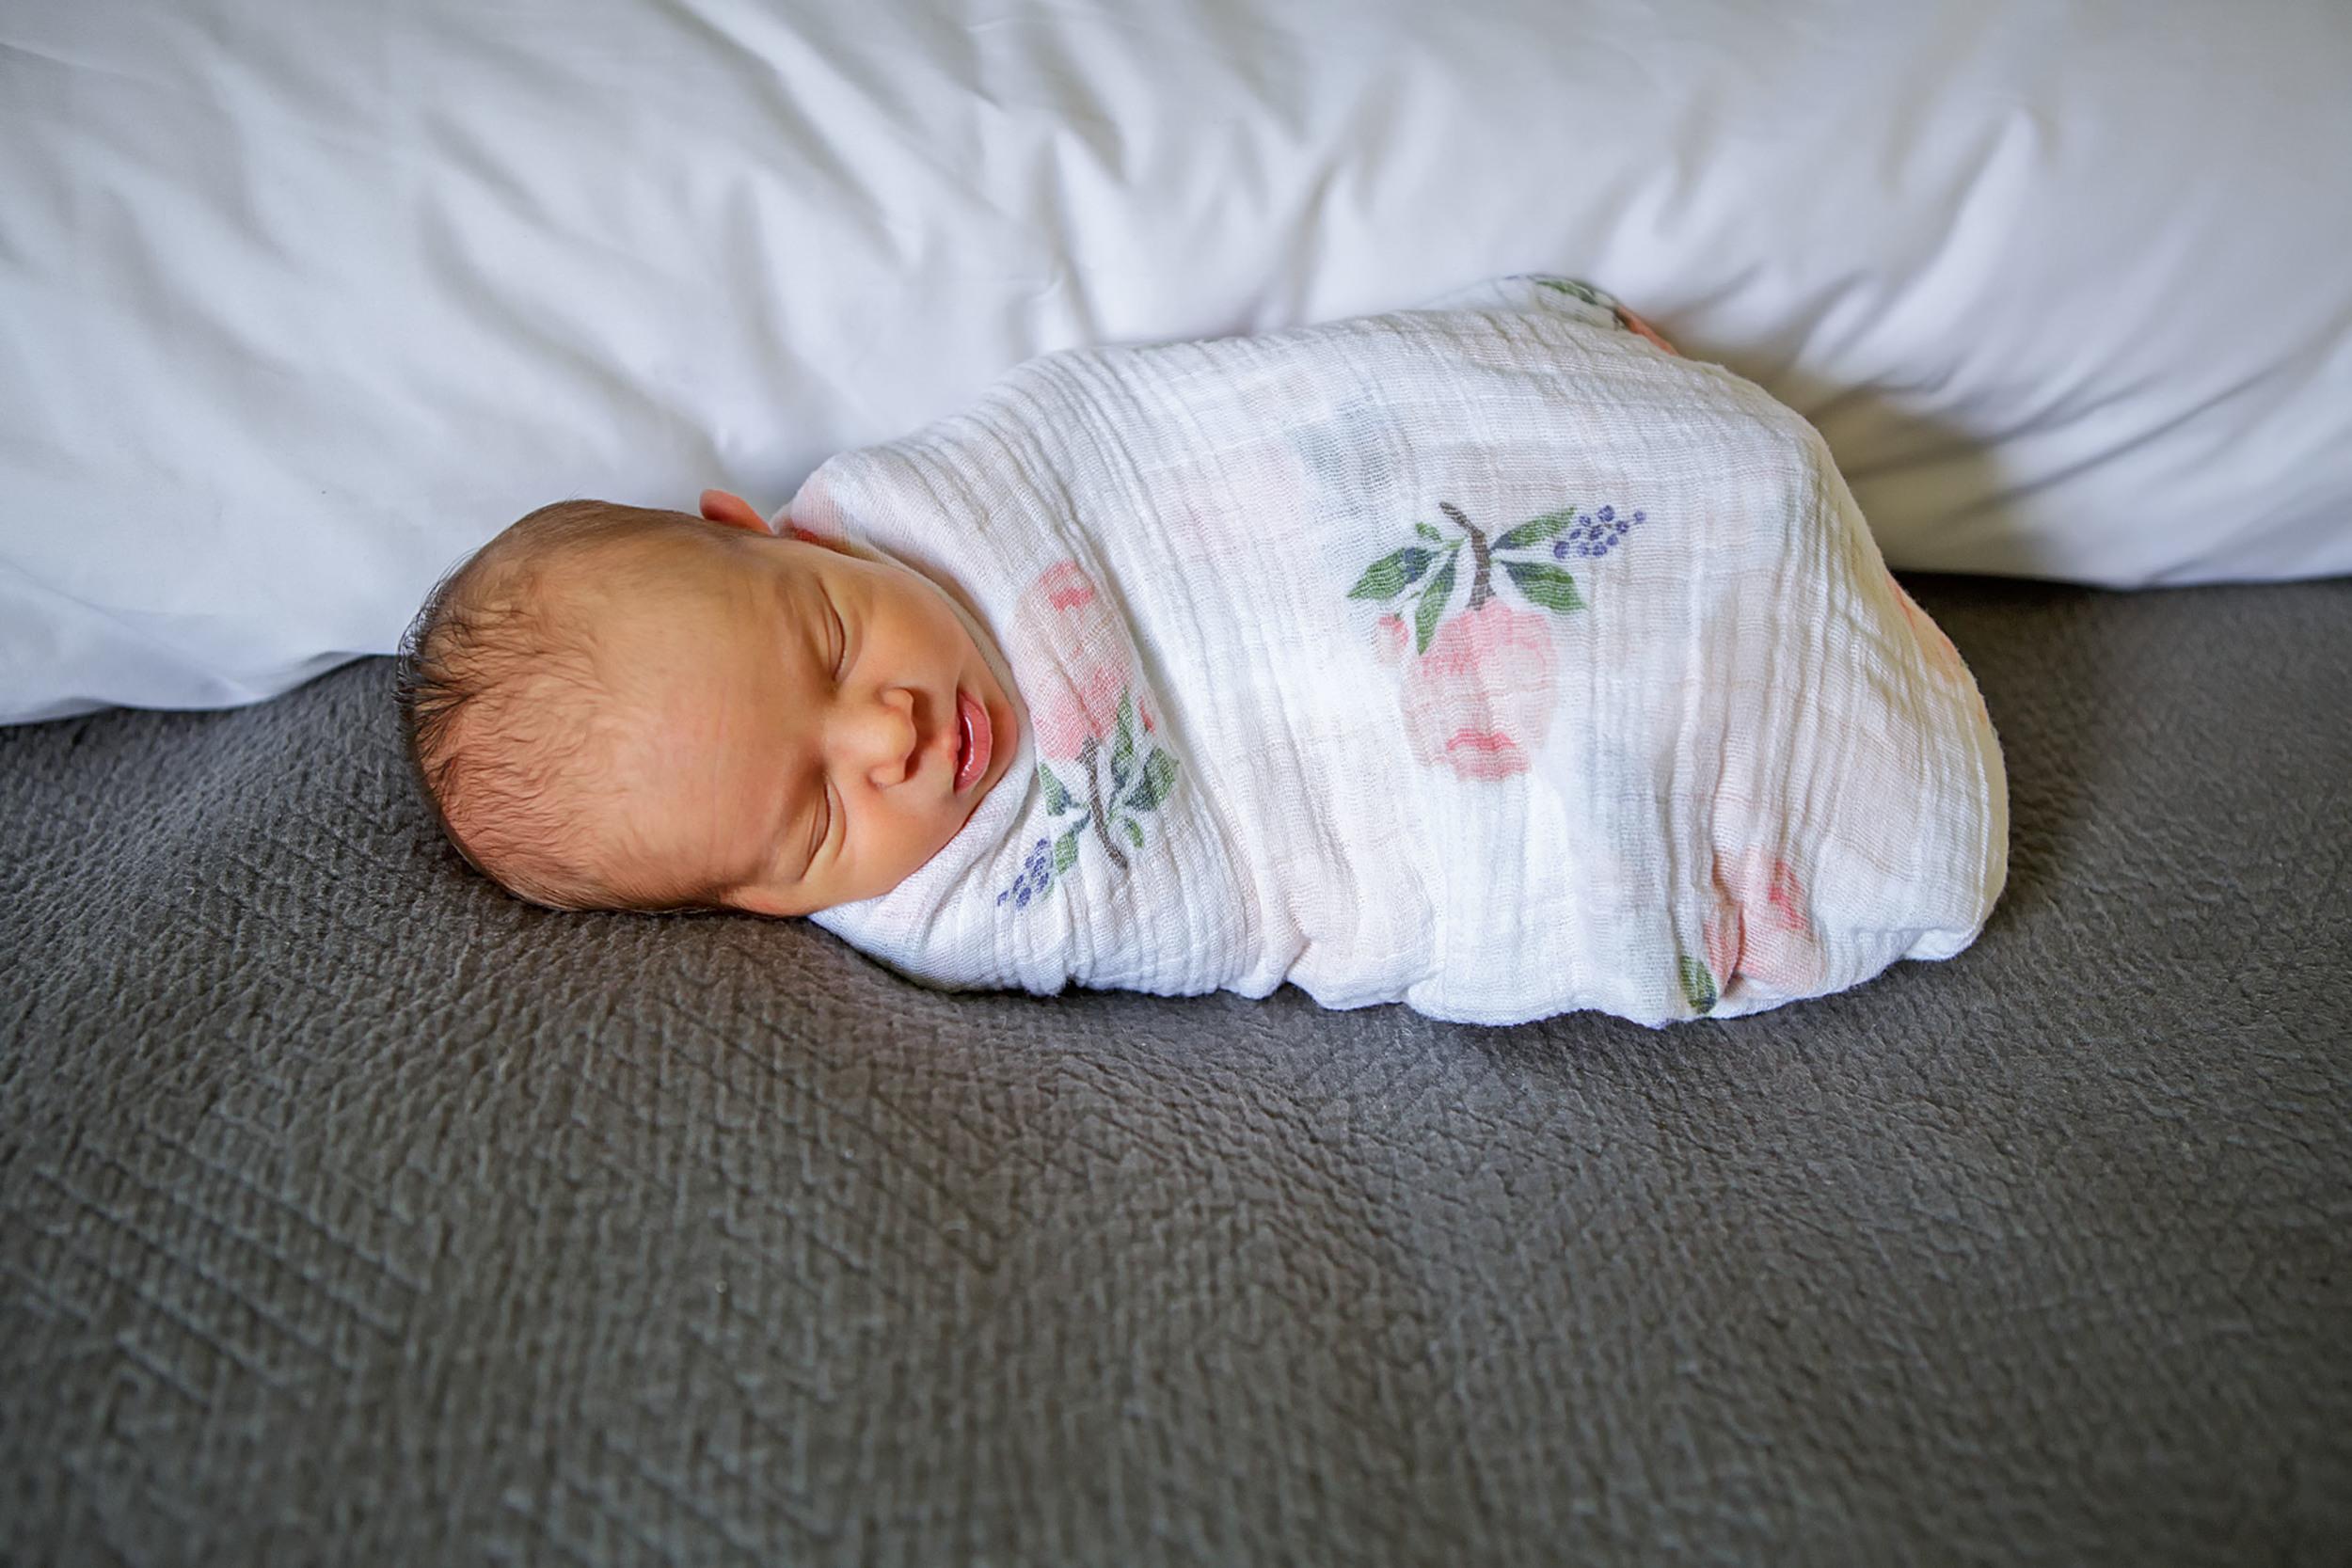 Southern_Pines_Newborn_Photographer_Tiffany_Abruzzo_Photography_19.jpg